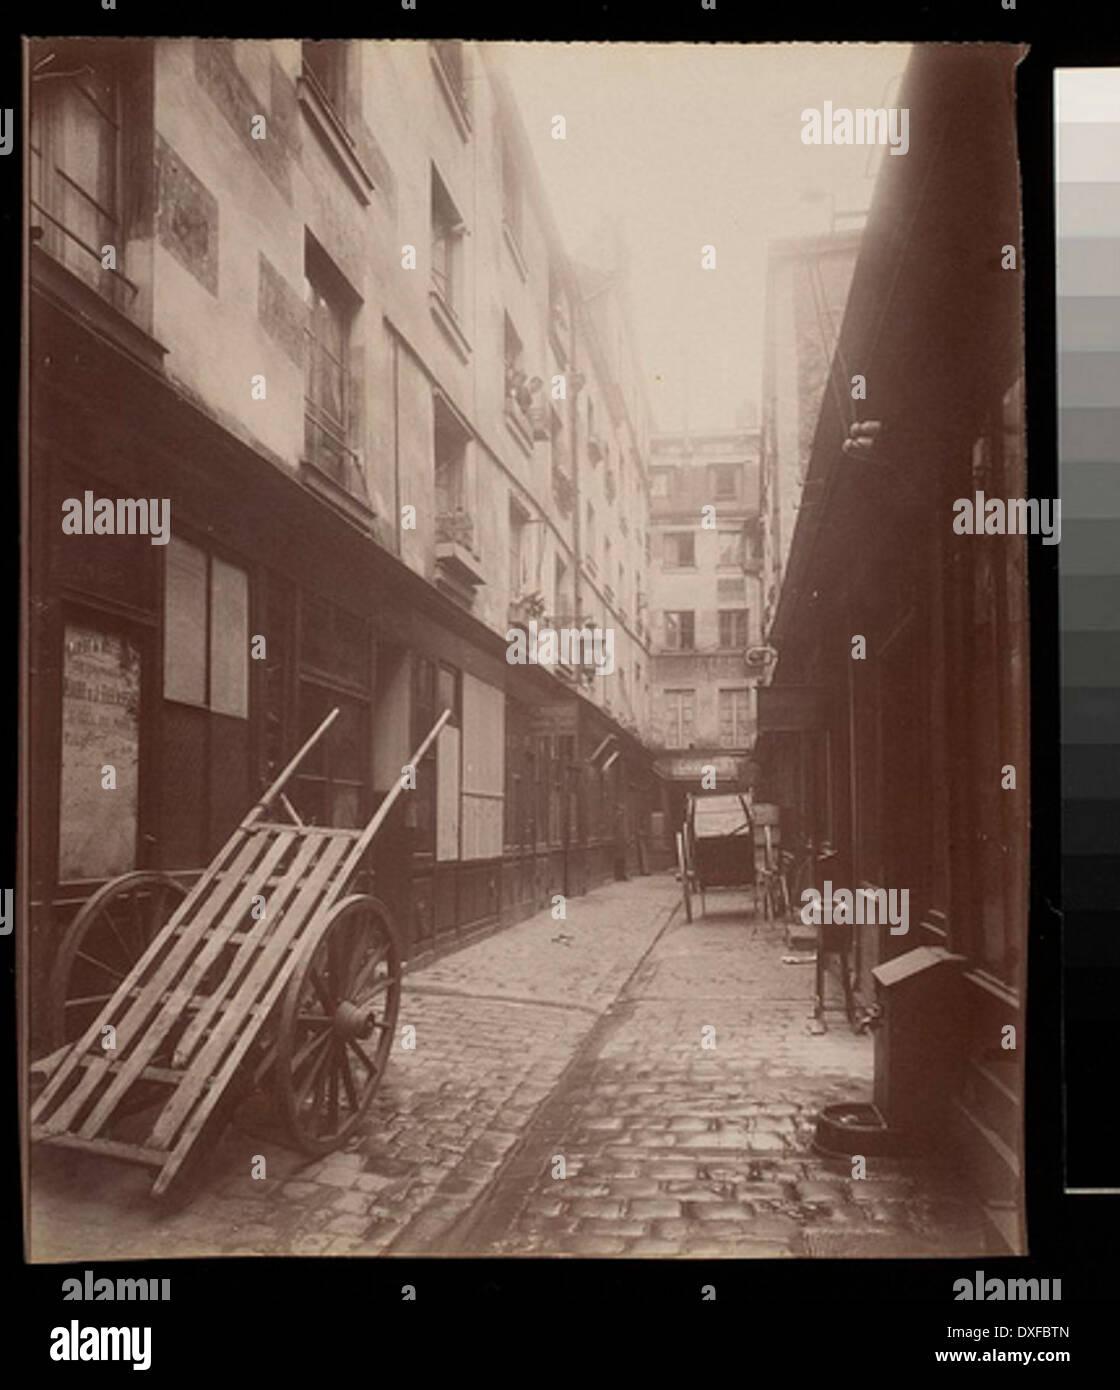 Passage Moliere Vue prise de la rue St. Martin (3e arr) Passage Moliere Vue prise de la rue St. Martin (3e arr) - Stock Image